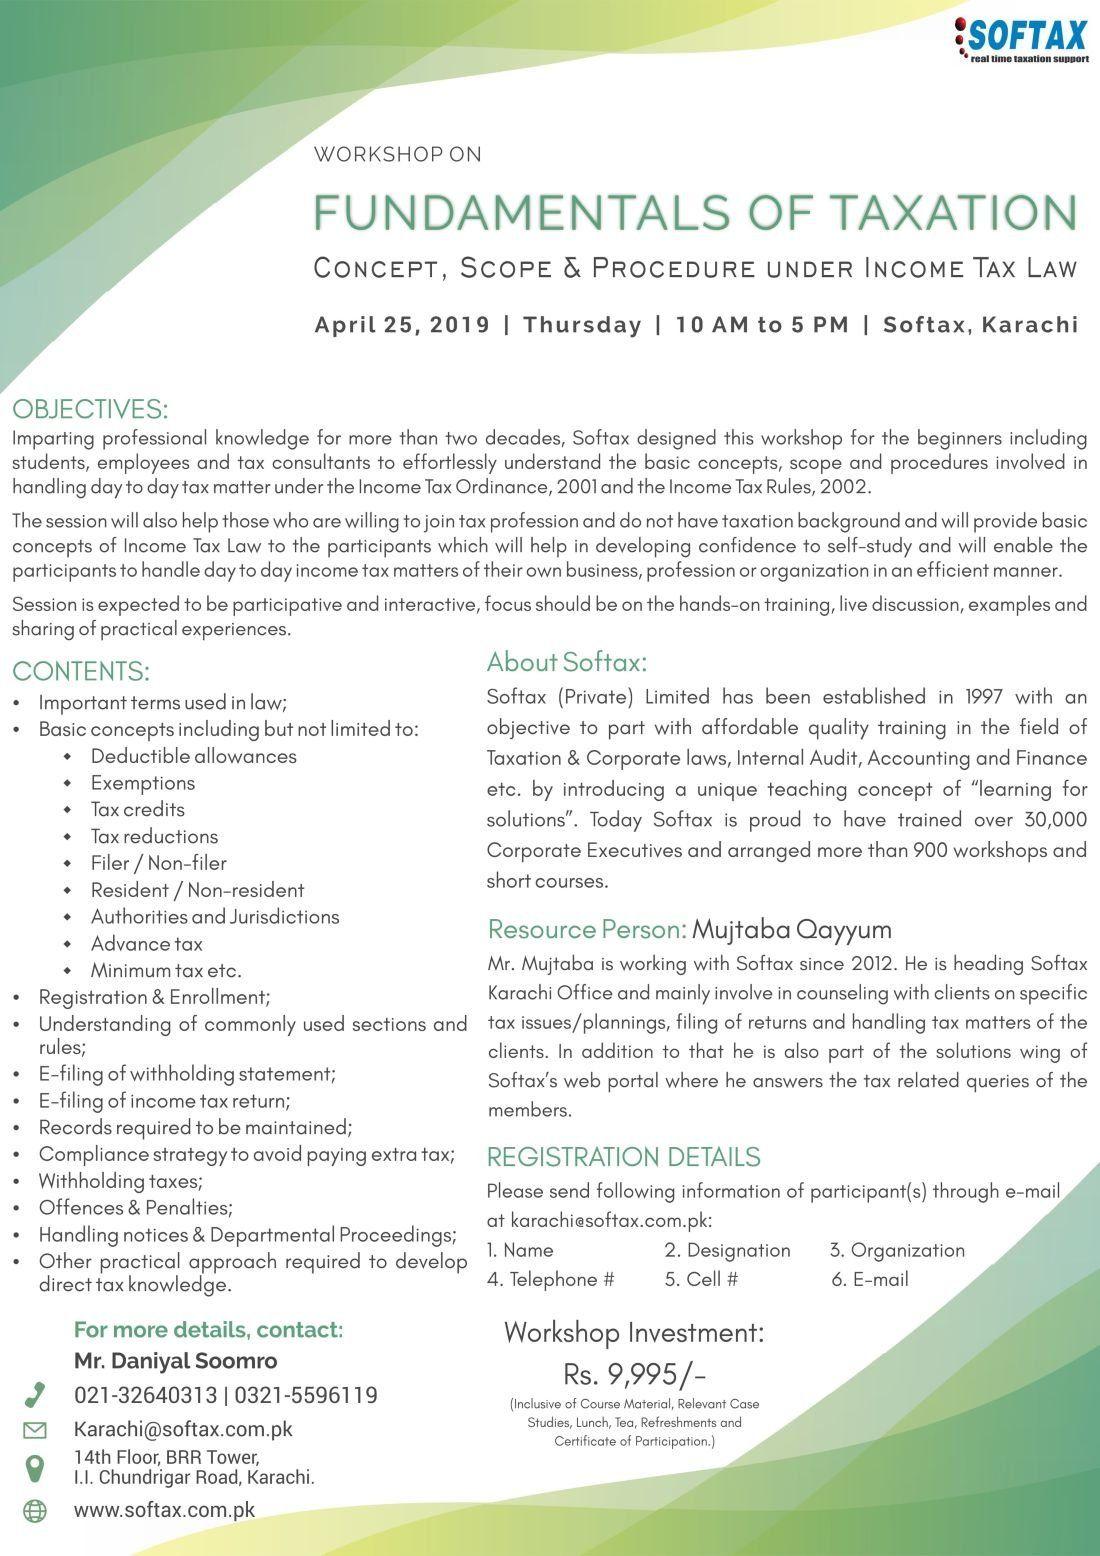 Workshop on Fundamentals of Taxation